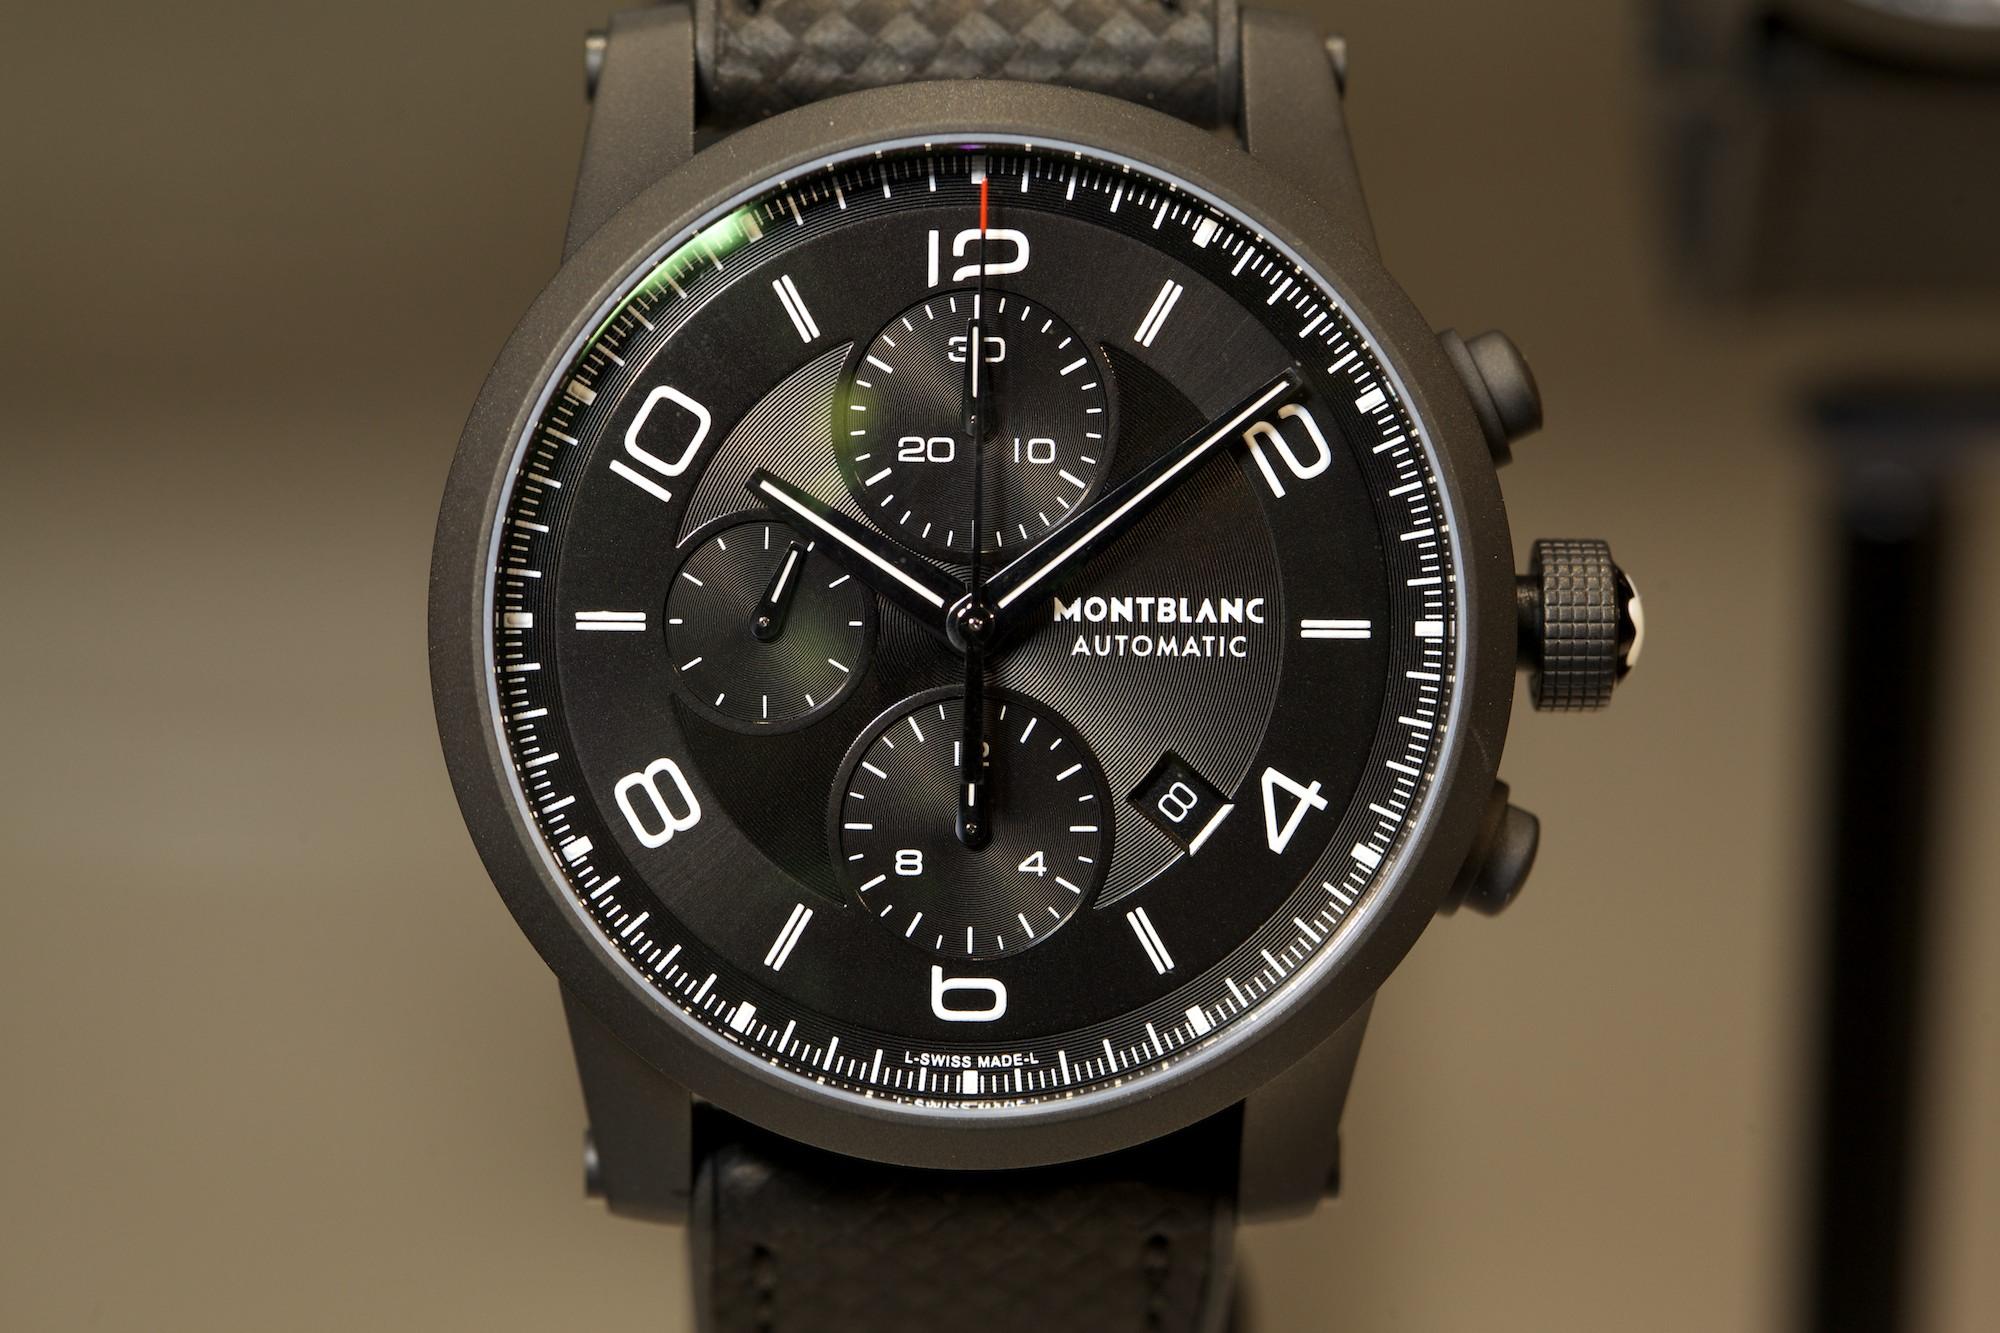 SIHH 2014 Montblanc Timewalker Extreme Chronograph DLC